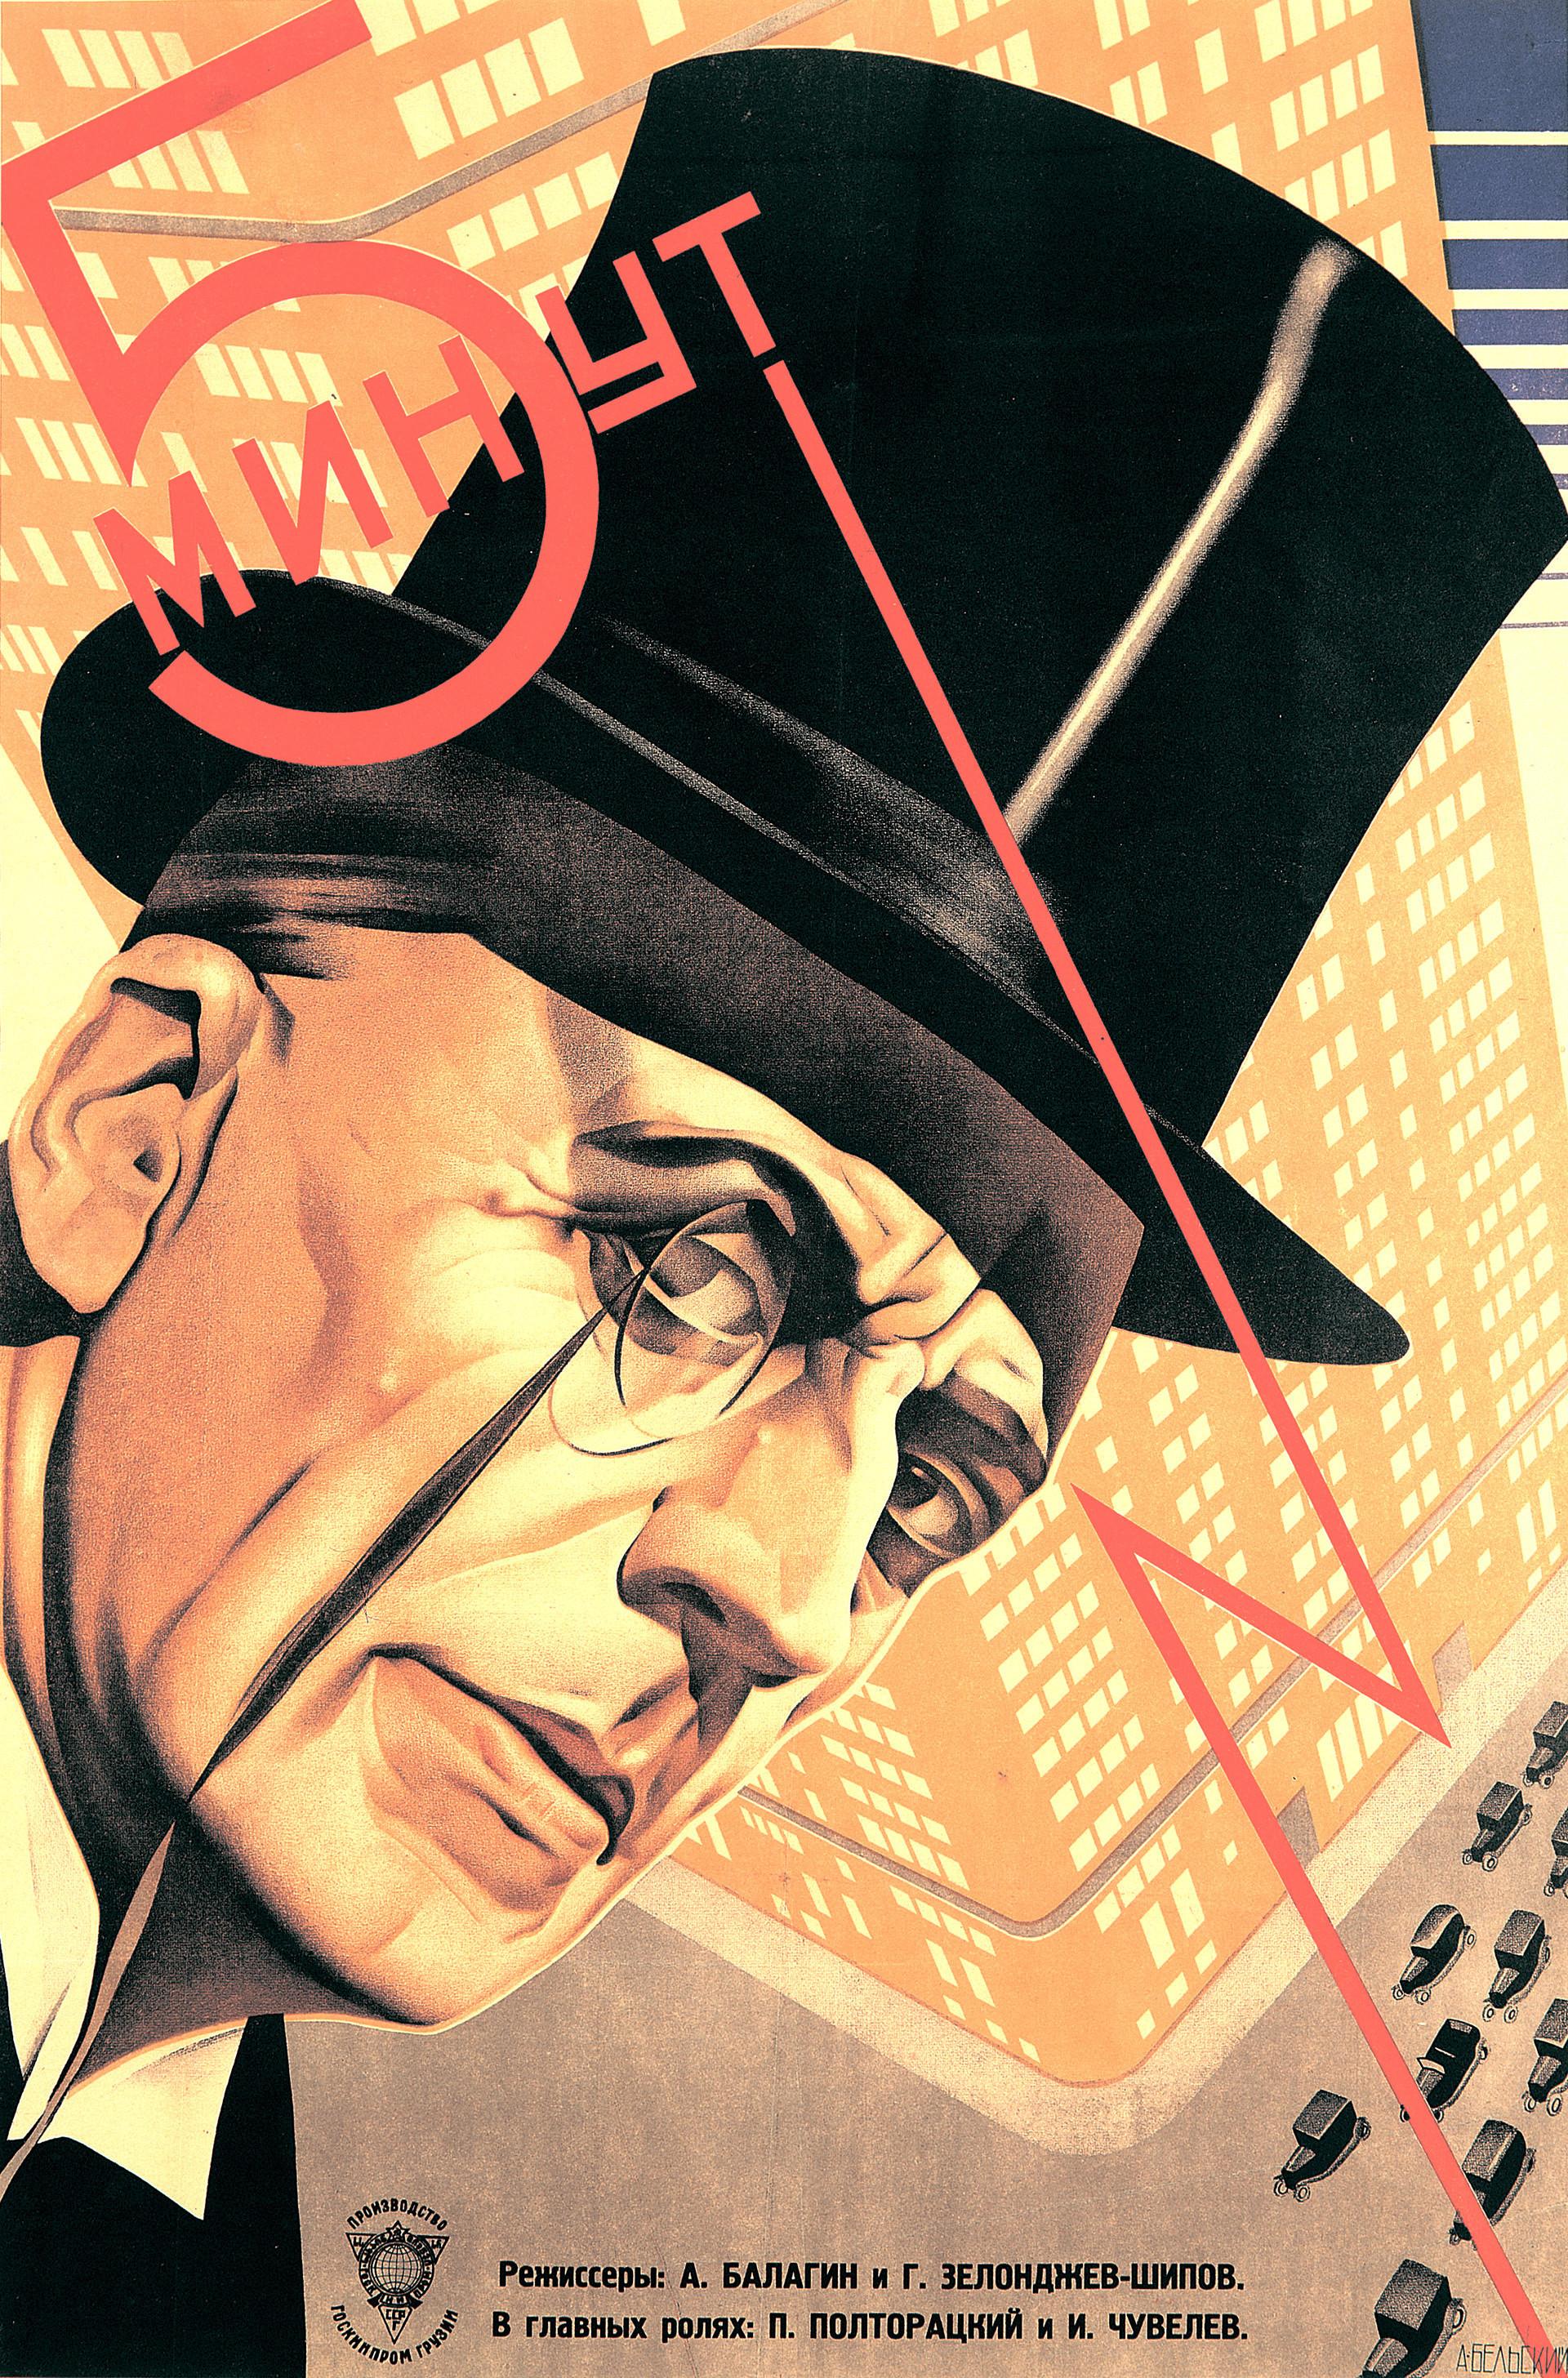 Nikolai Prusakov, cartaz do filme 'Piat minut', 1929